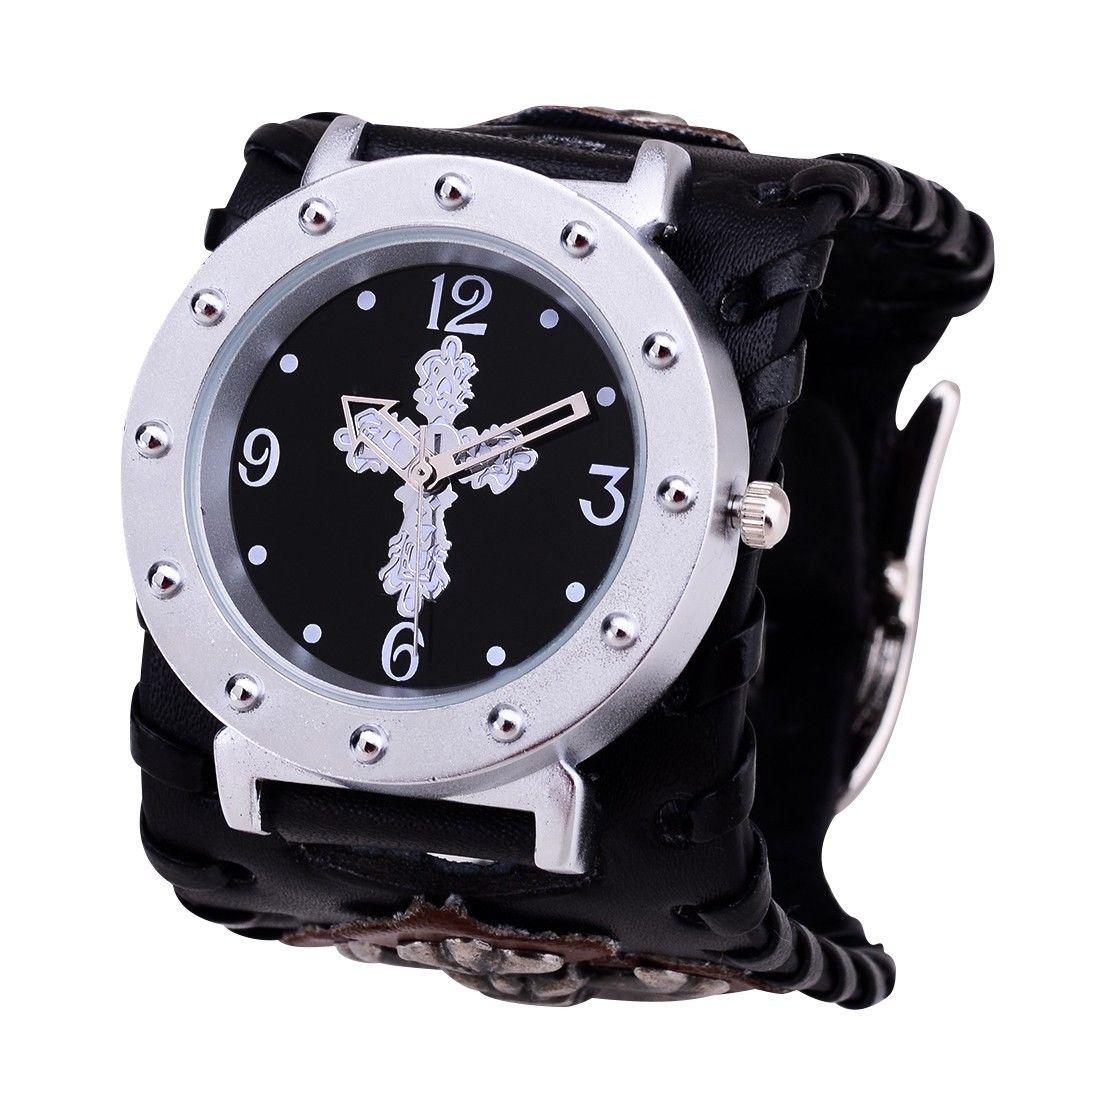 white_cross_rock_punk_leather_heavy_cuff_chain_skull_bracelet_wrist_watch_watches_3.JPG